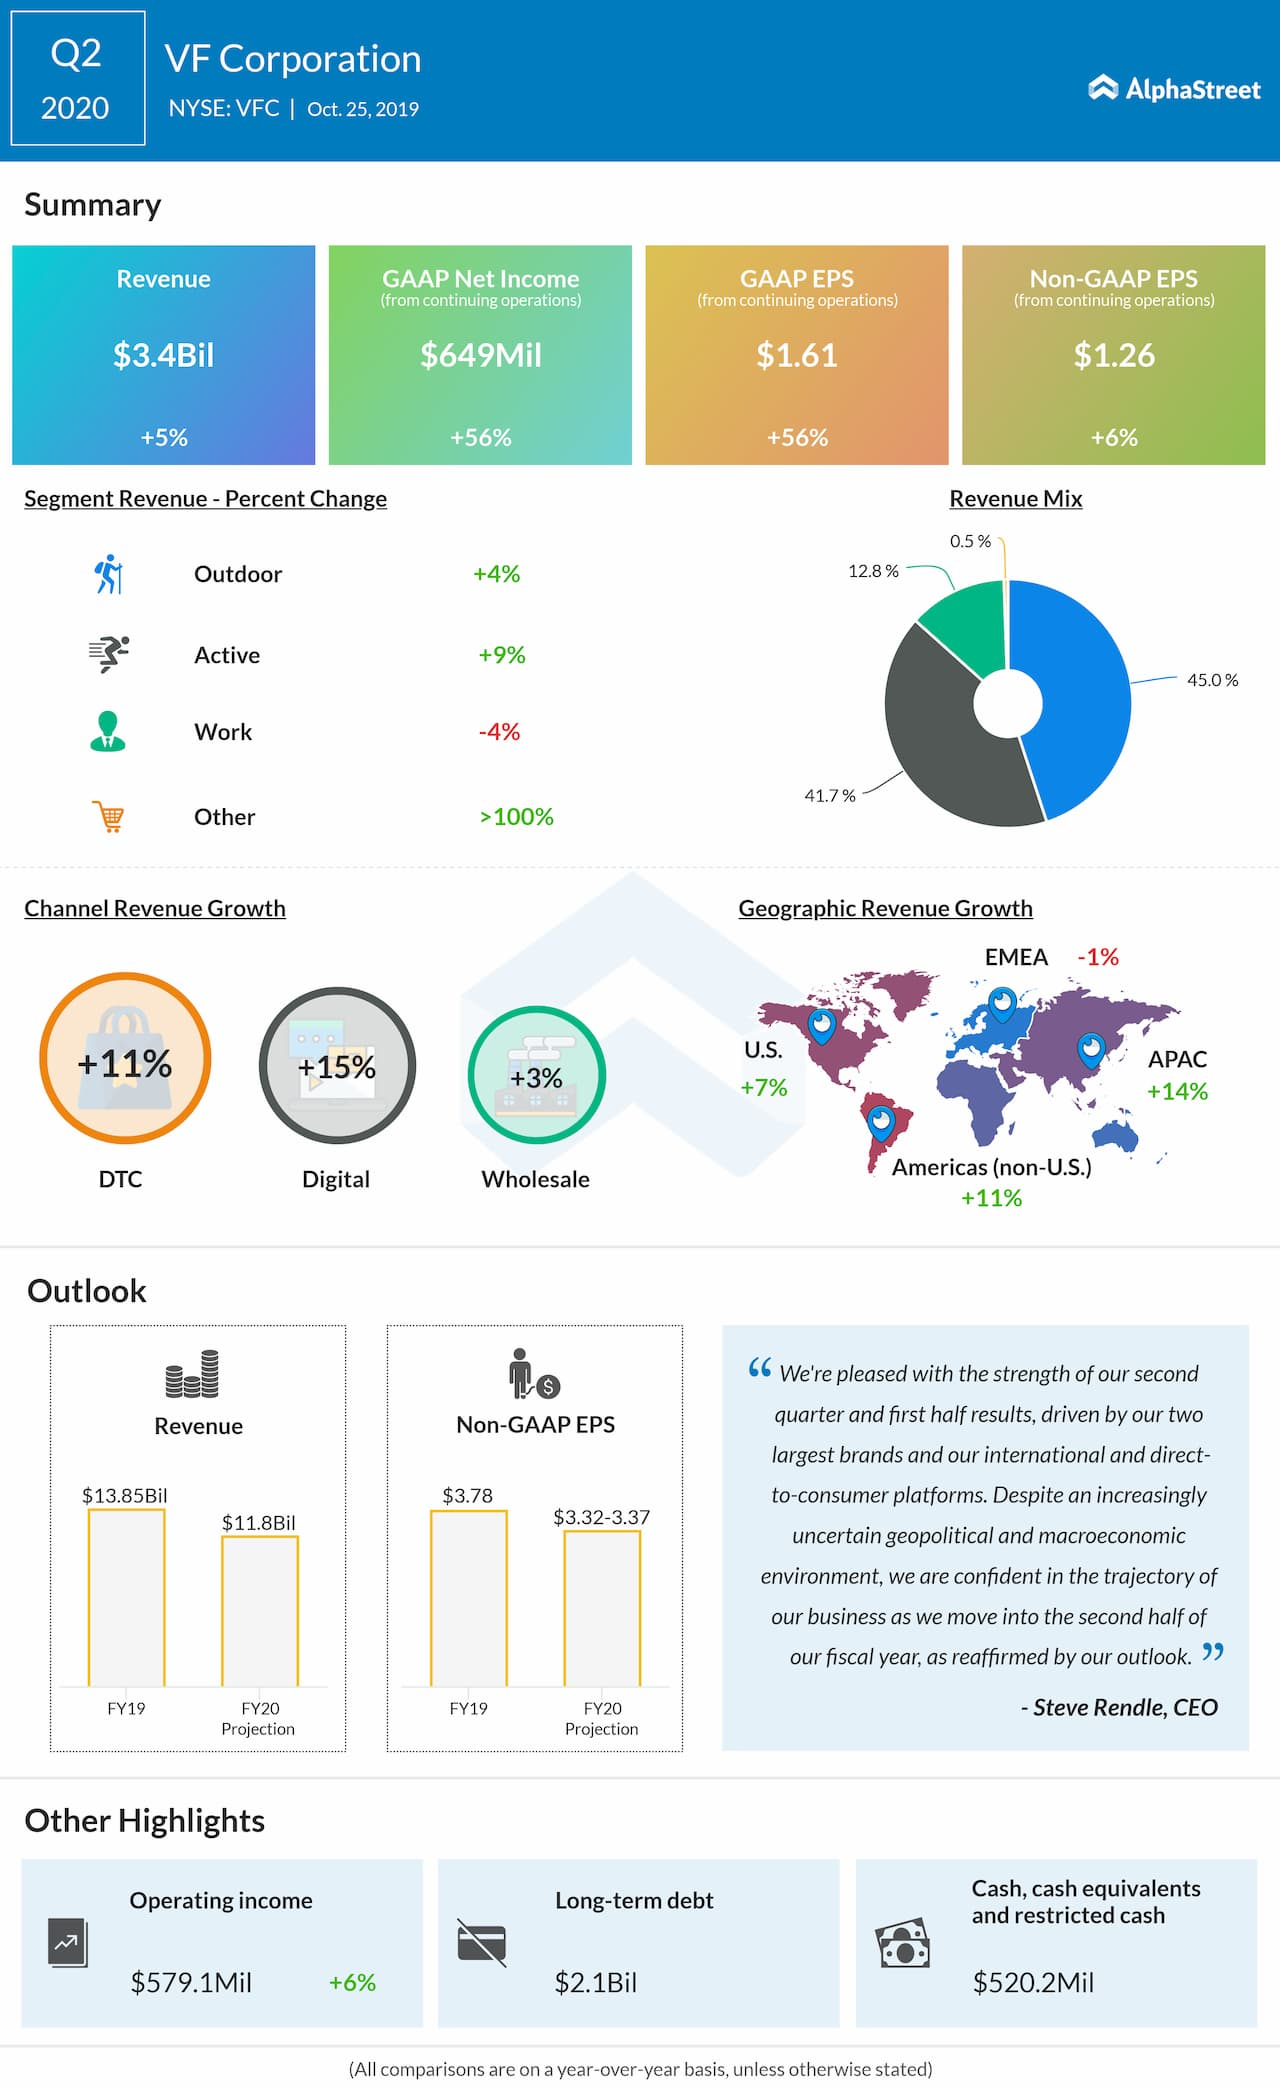 VF Corporation (NYSE: VFC): Q2 2020 Earnings Snapshot